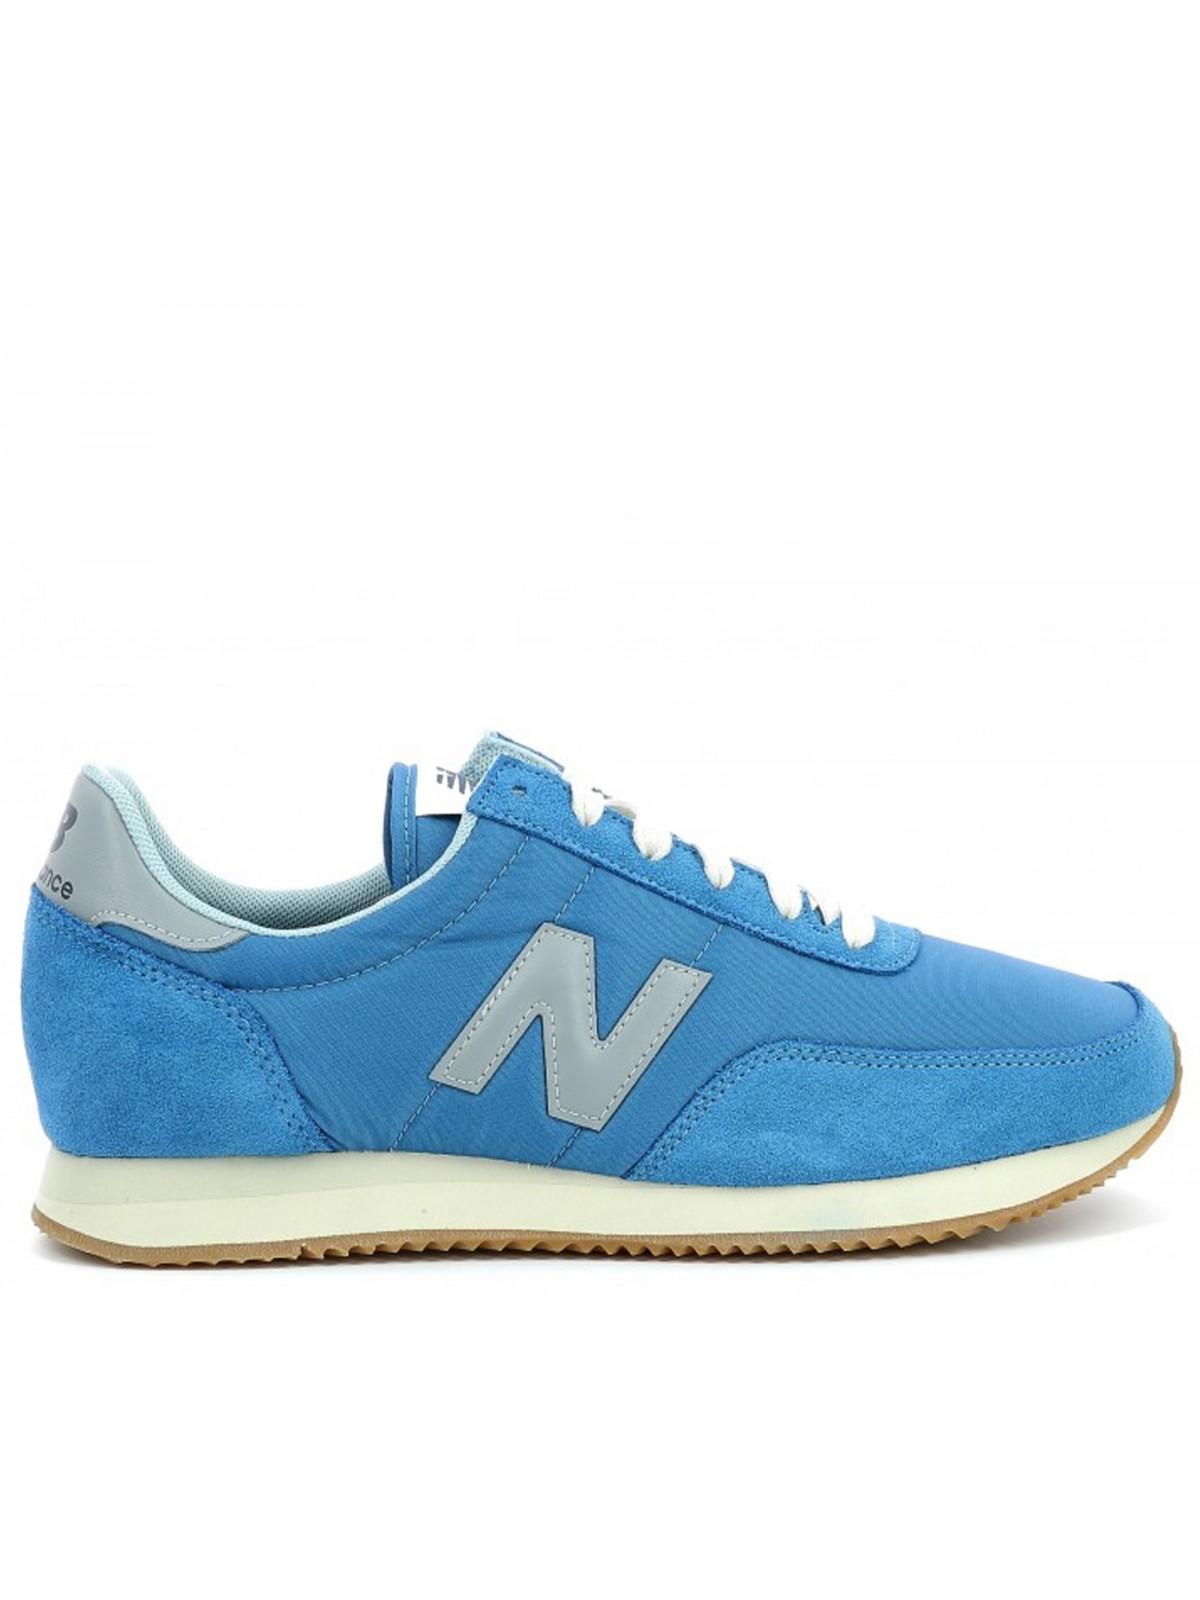 New Balance UL720 nylon blue